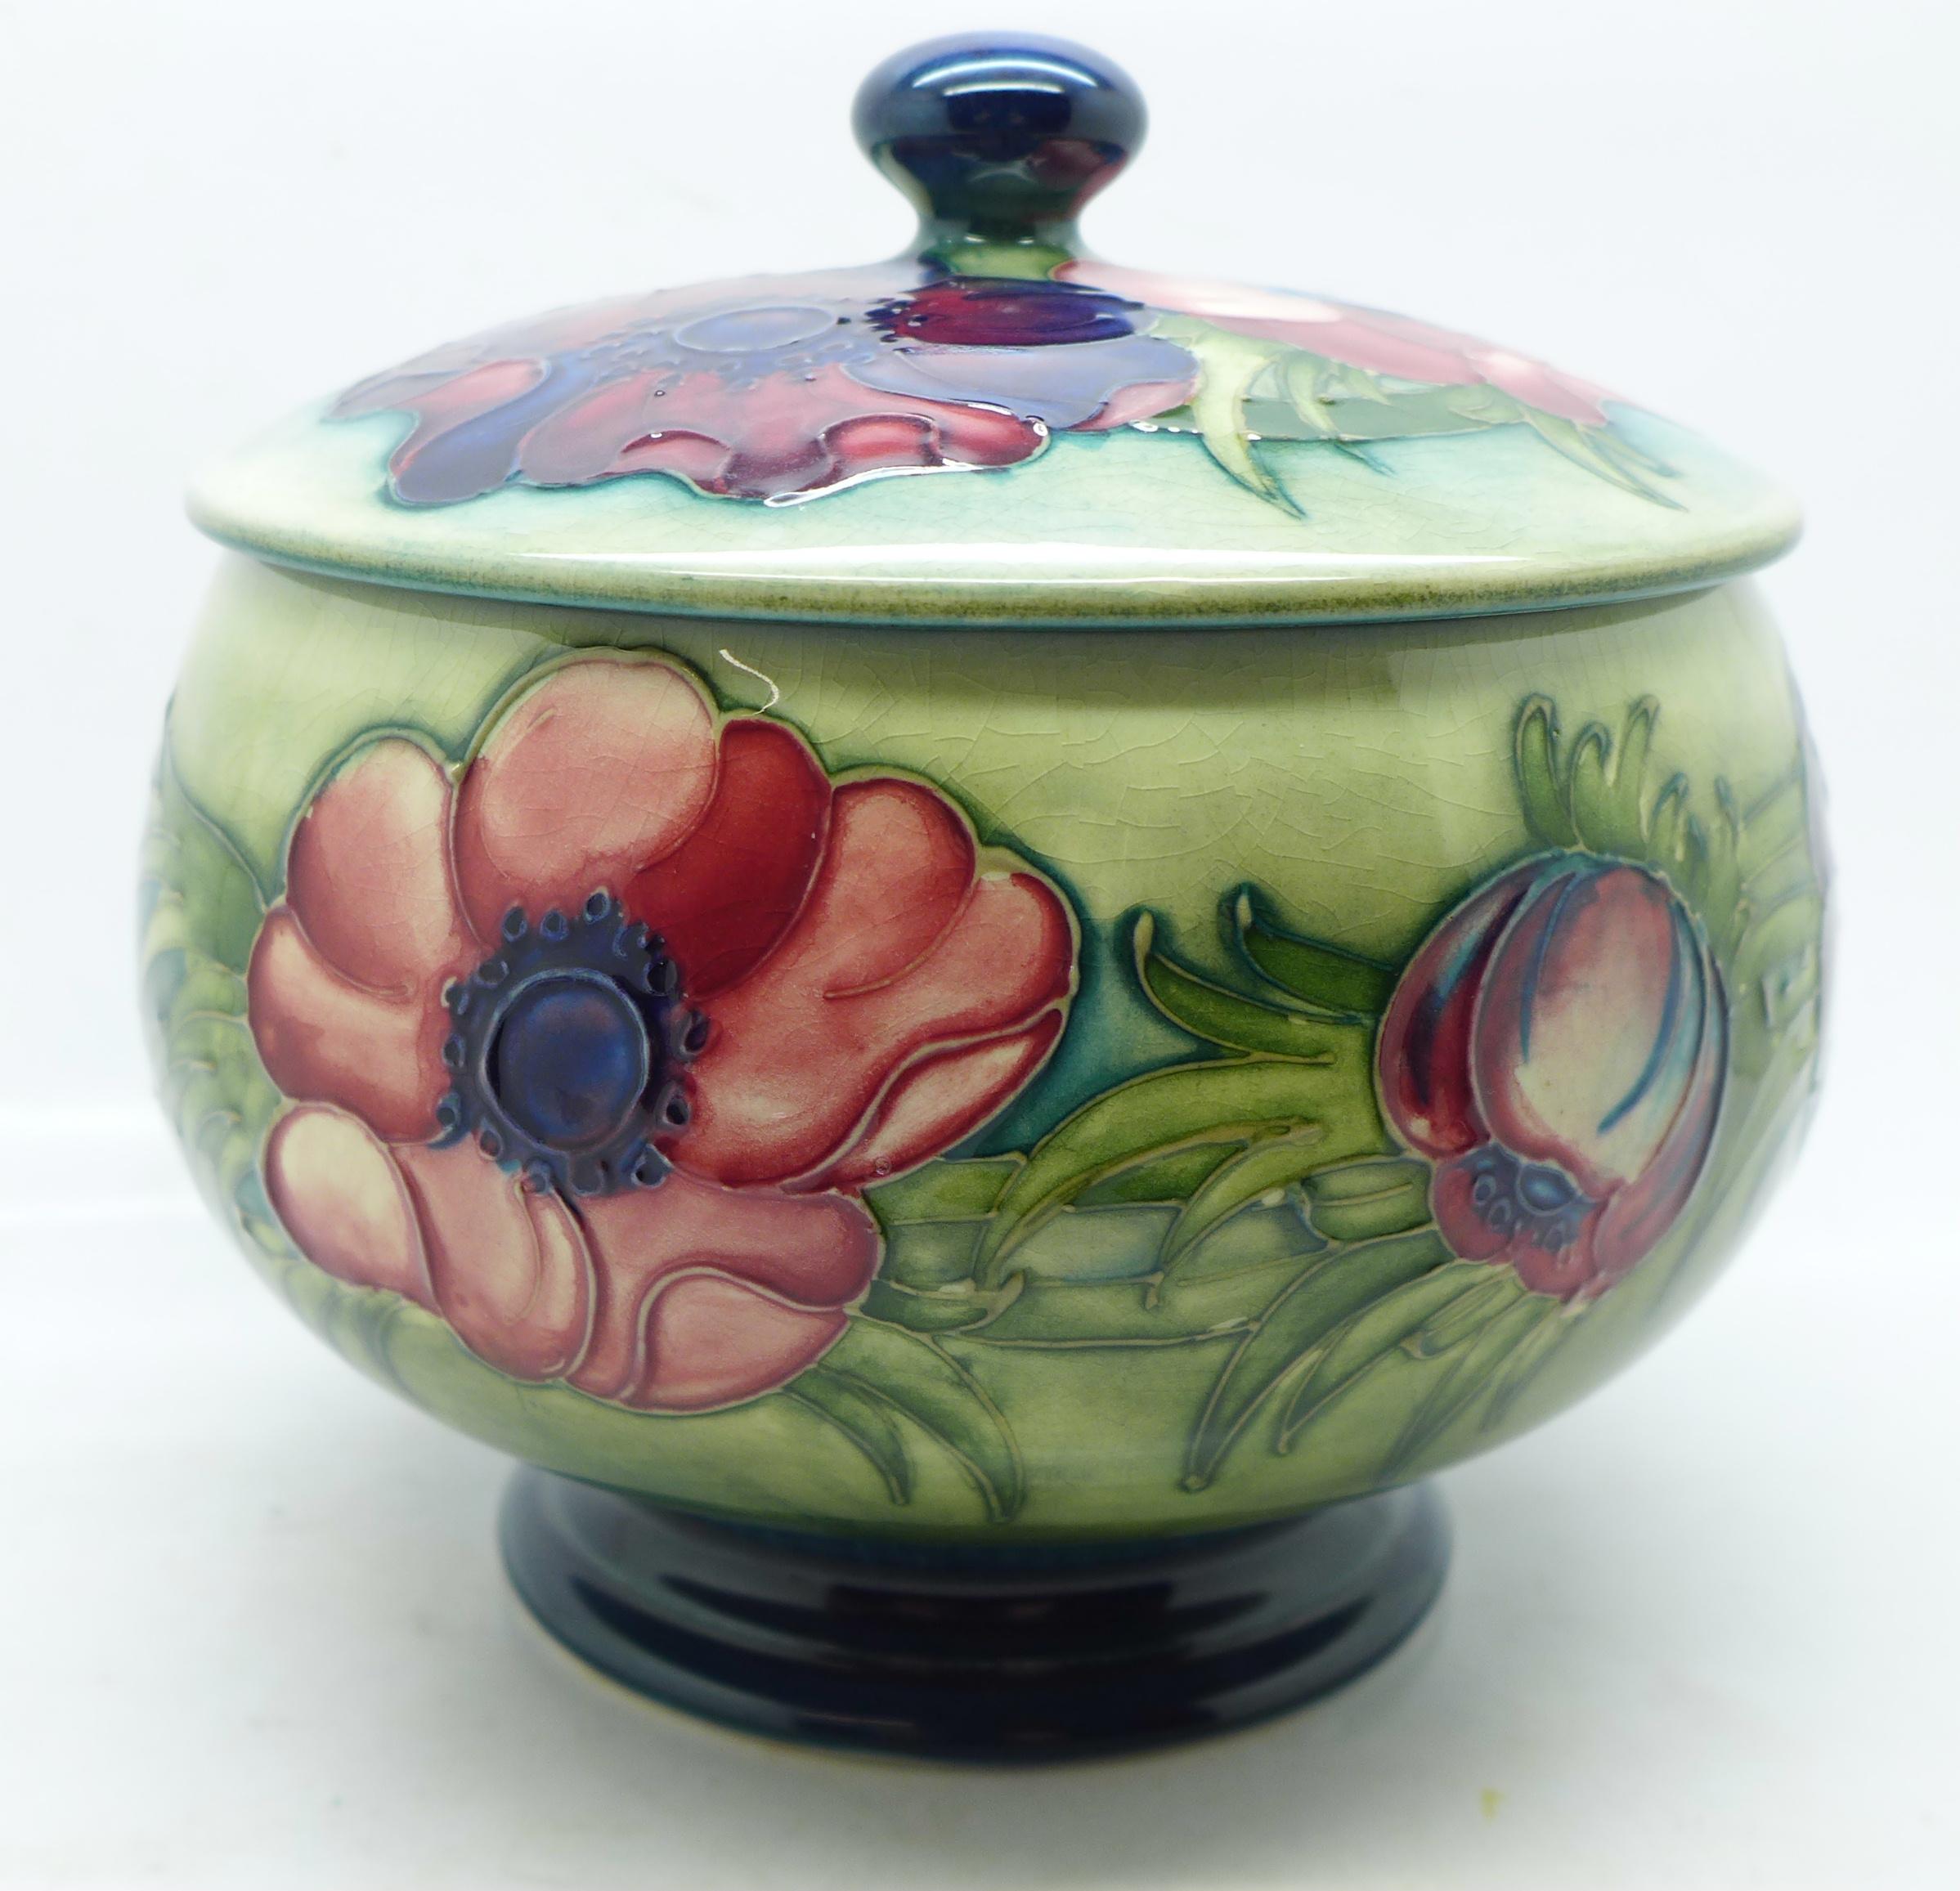 A Moorcroft anemone lidded pot, 12.5cm diameter - Image 4 of 8